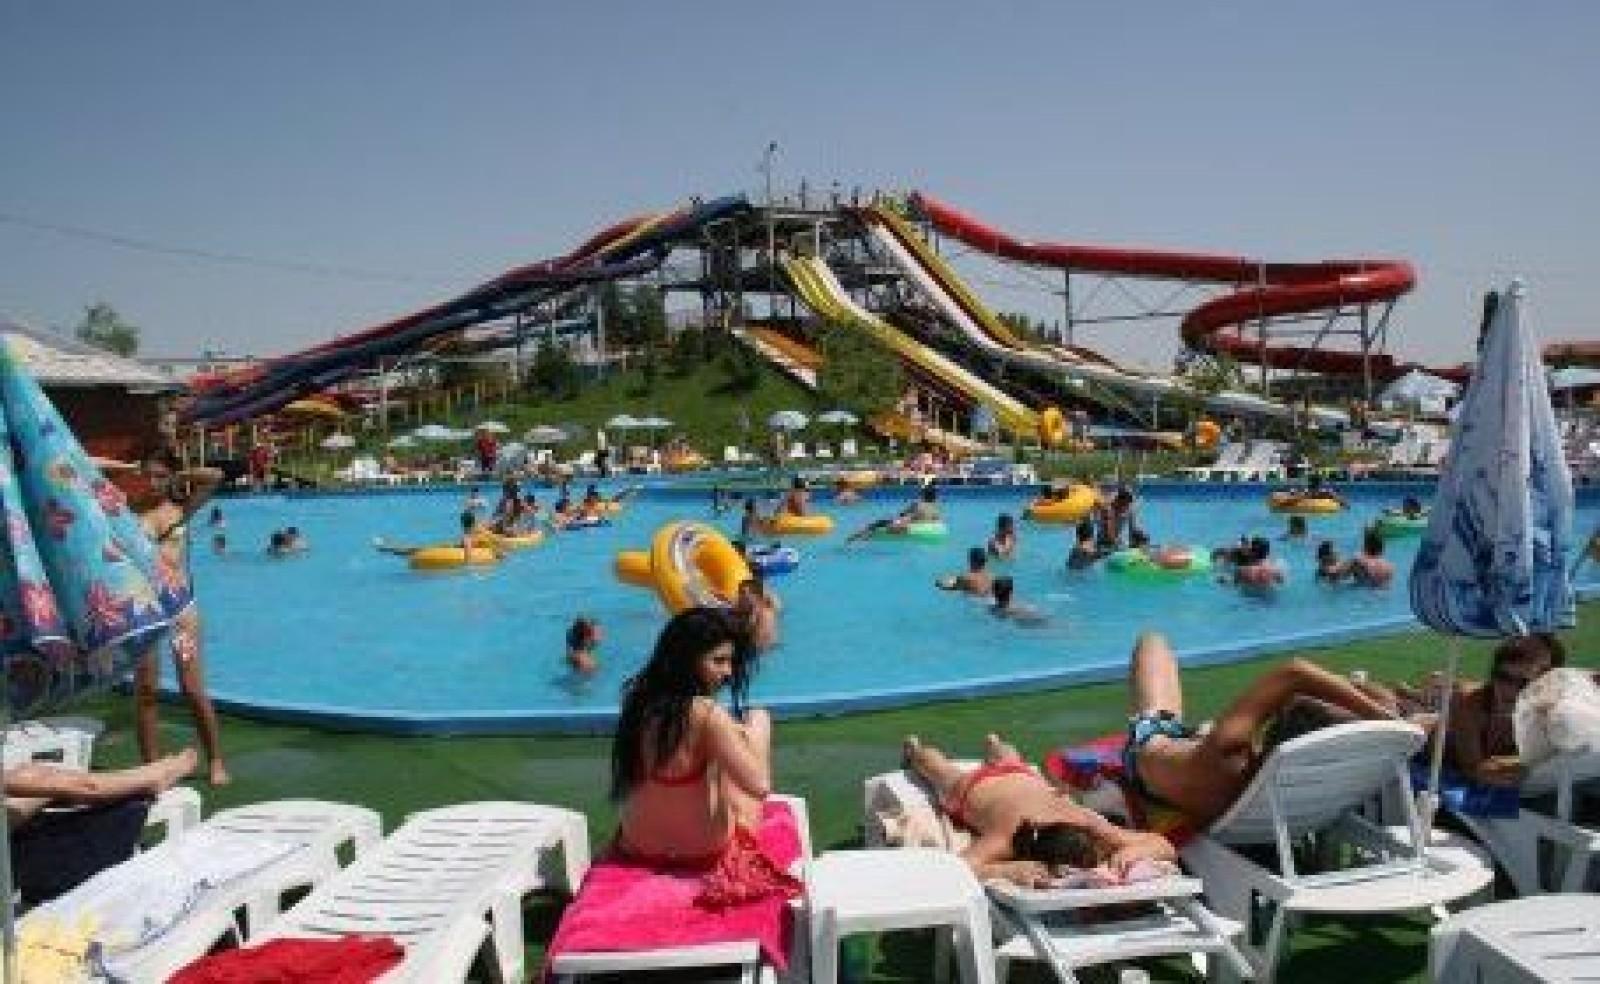 Imagini pentru water park otopeni photos